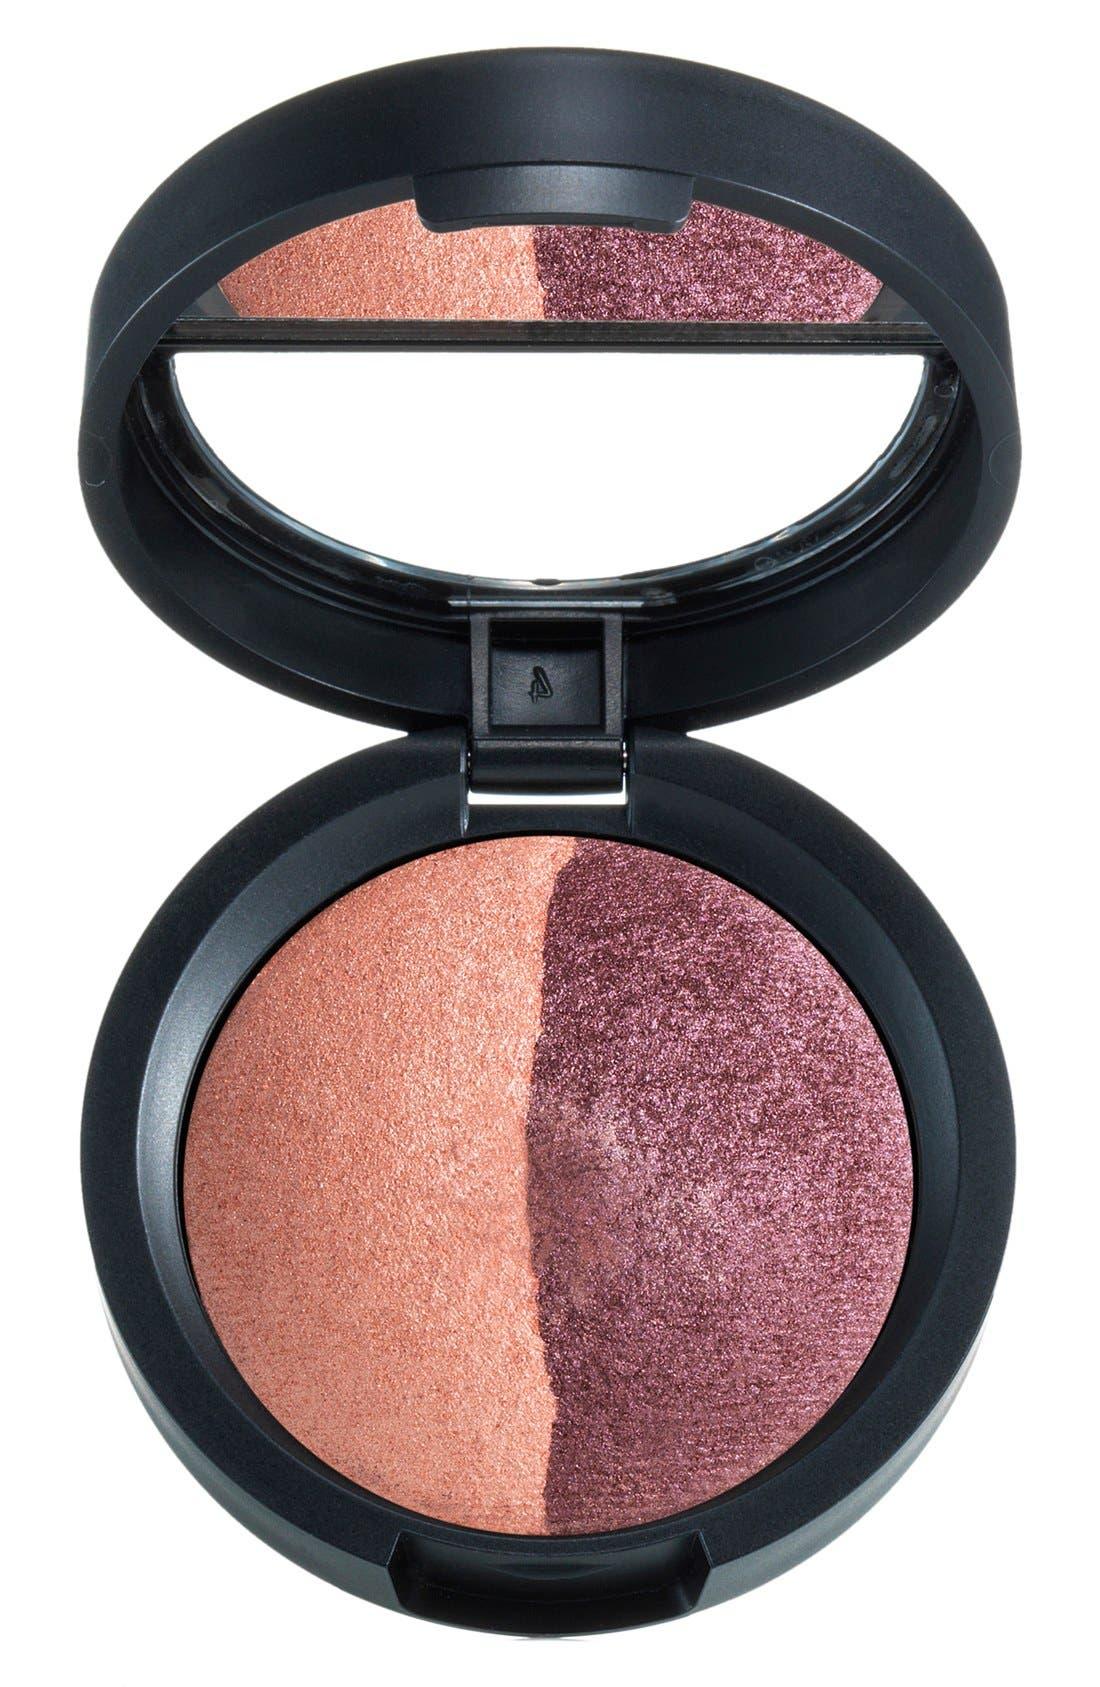 Baked Color Intense Eyeshadow Duo,                             Main thumbnail 5, color,